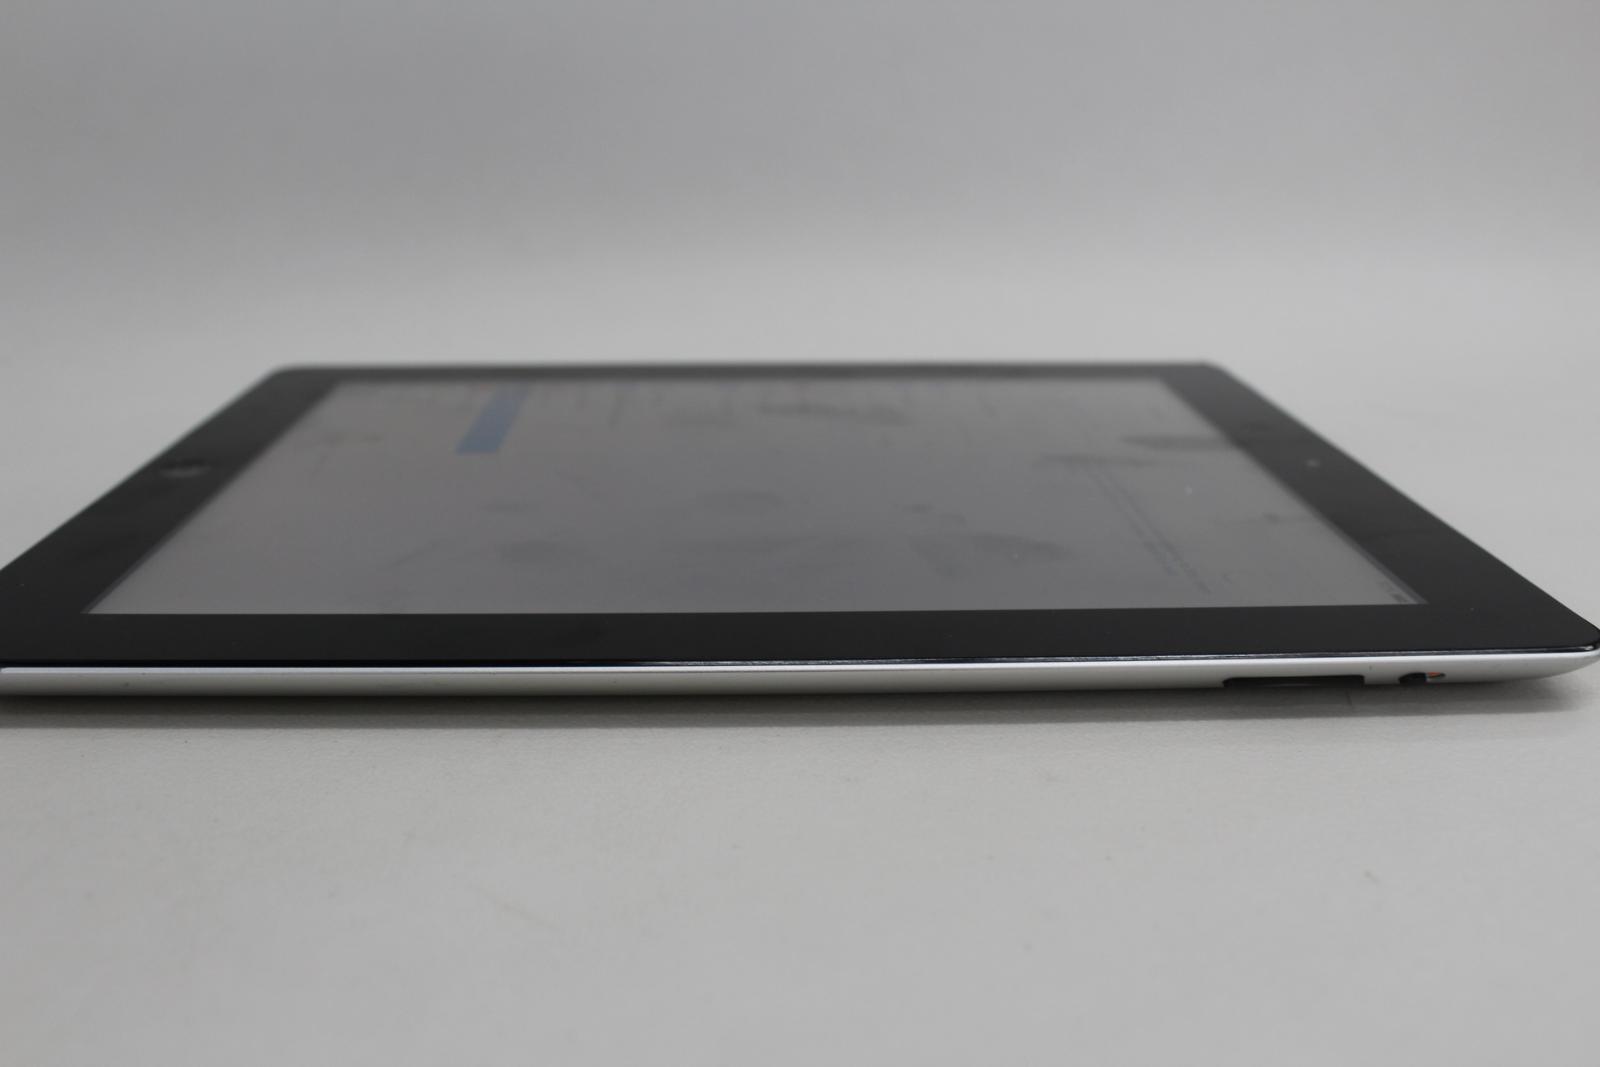 APPLE-iPad-4th-Gen-Tablet-9-7-inch-122-94GB-Black-Bezel-Wi-Fi-Model-A1460 thumbnail 5